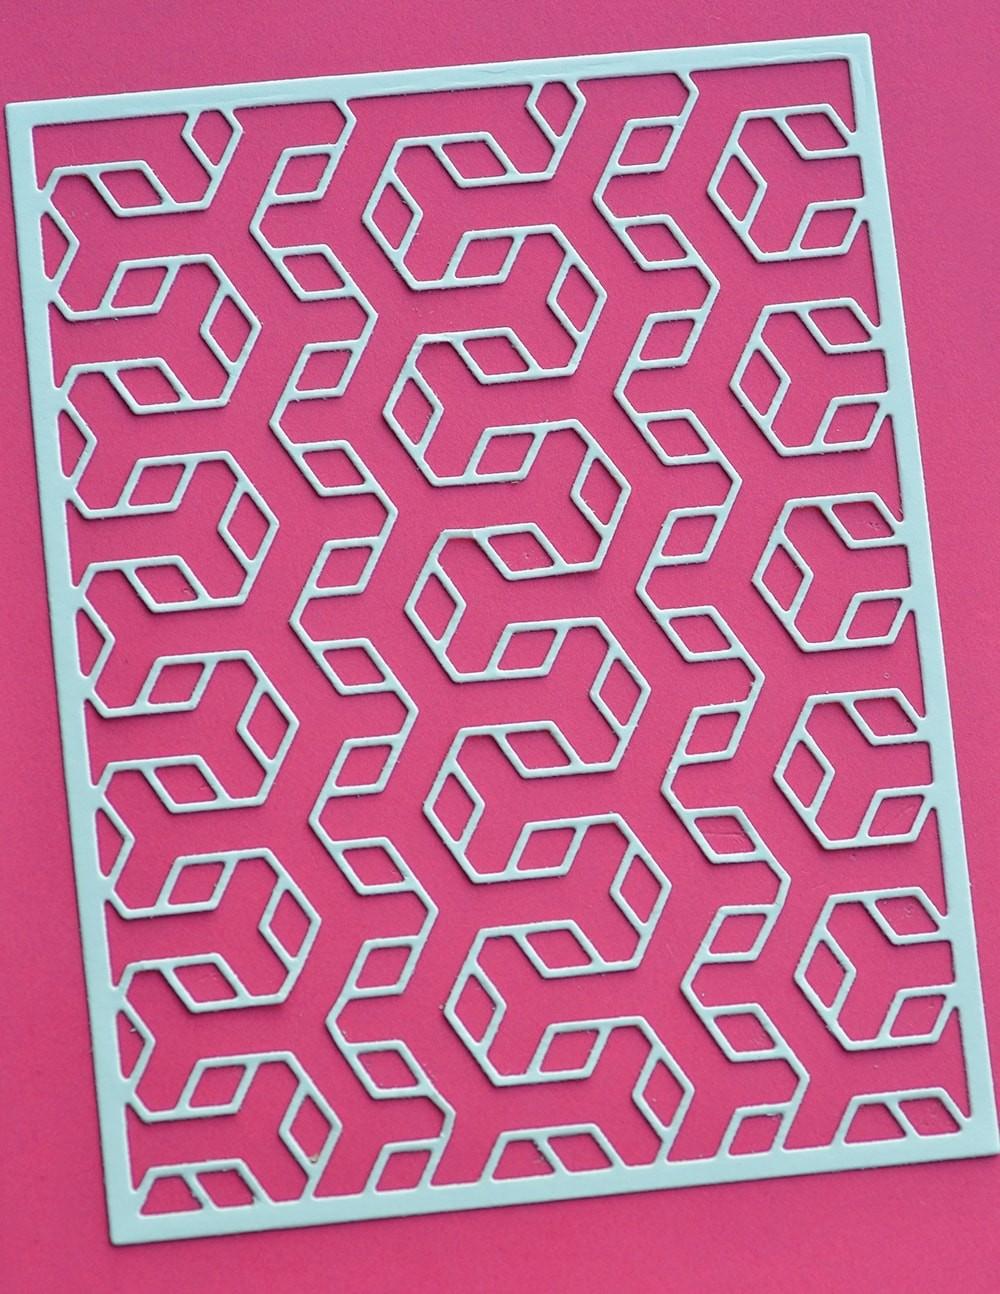 Birch Press Interlock Frame 57450